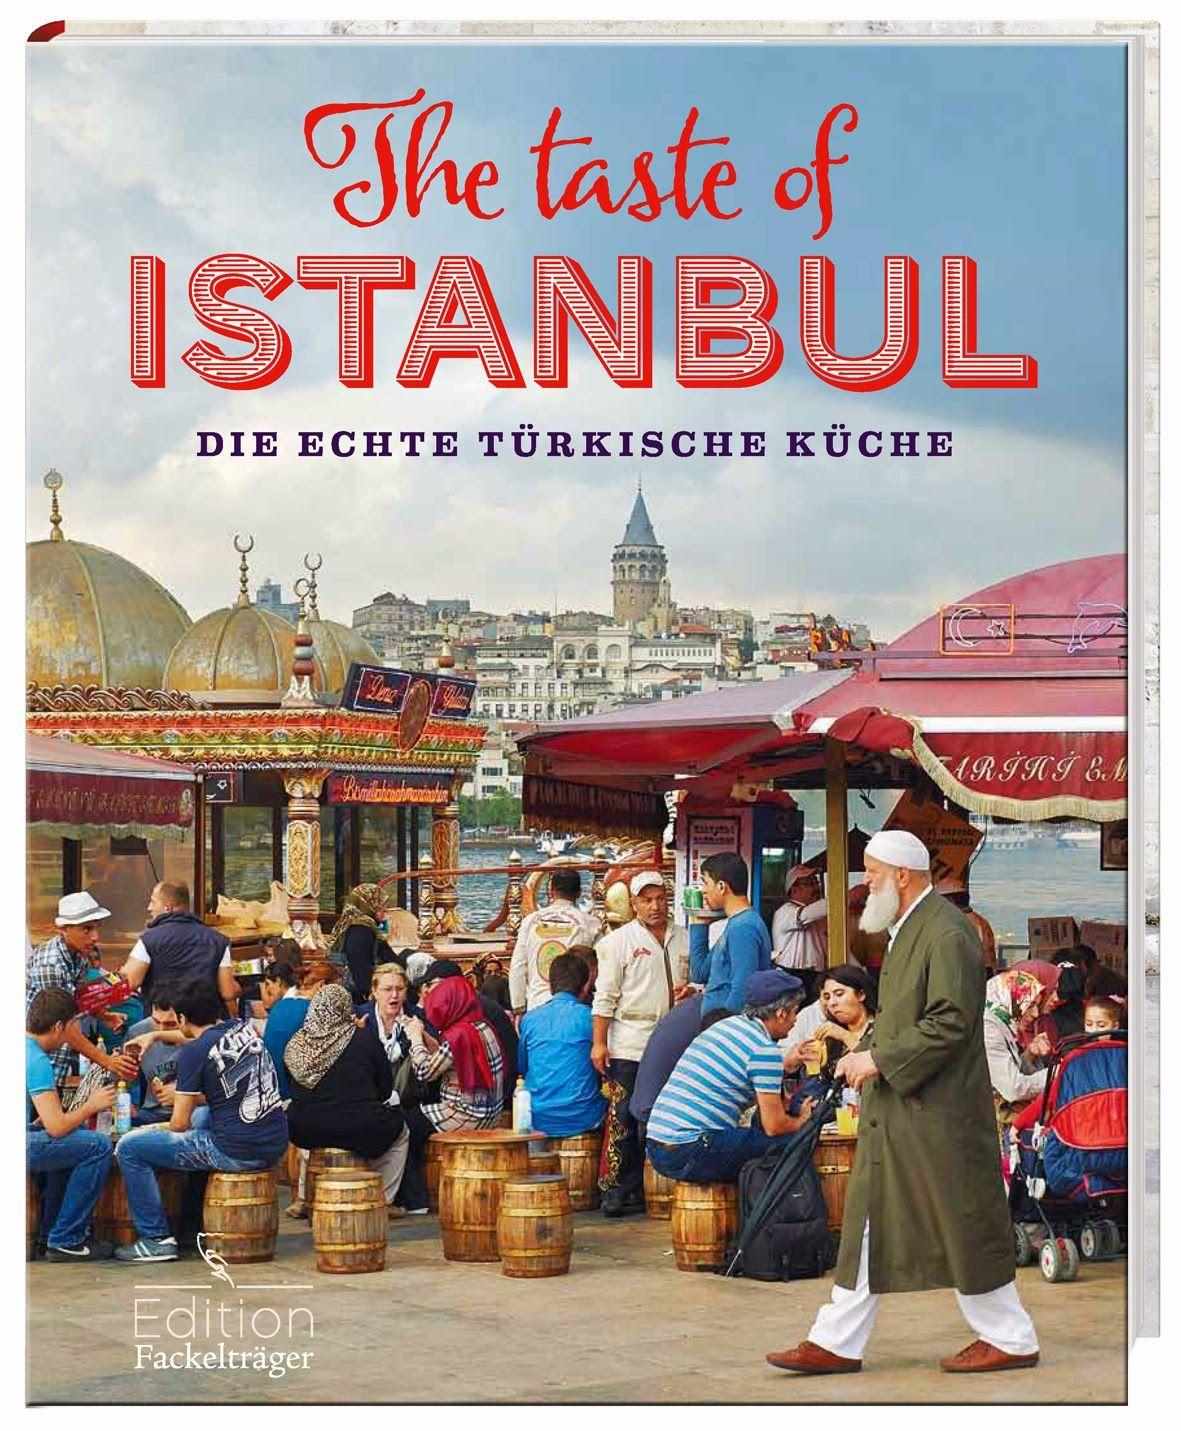 Insane in the Kitchen: The taste of Istanbul -  Kochbuch-Rezension und Ve...